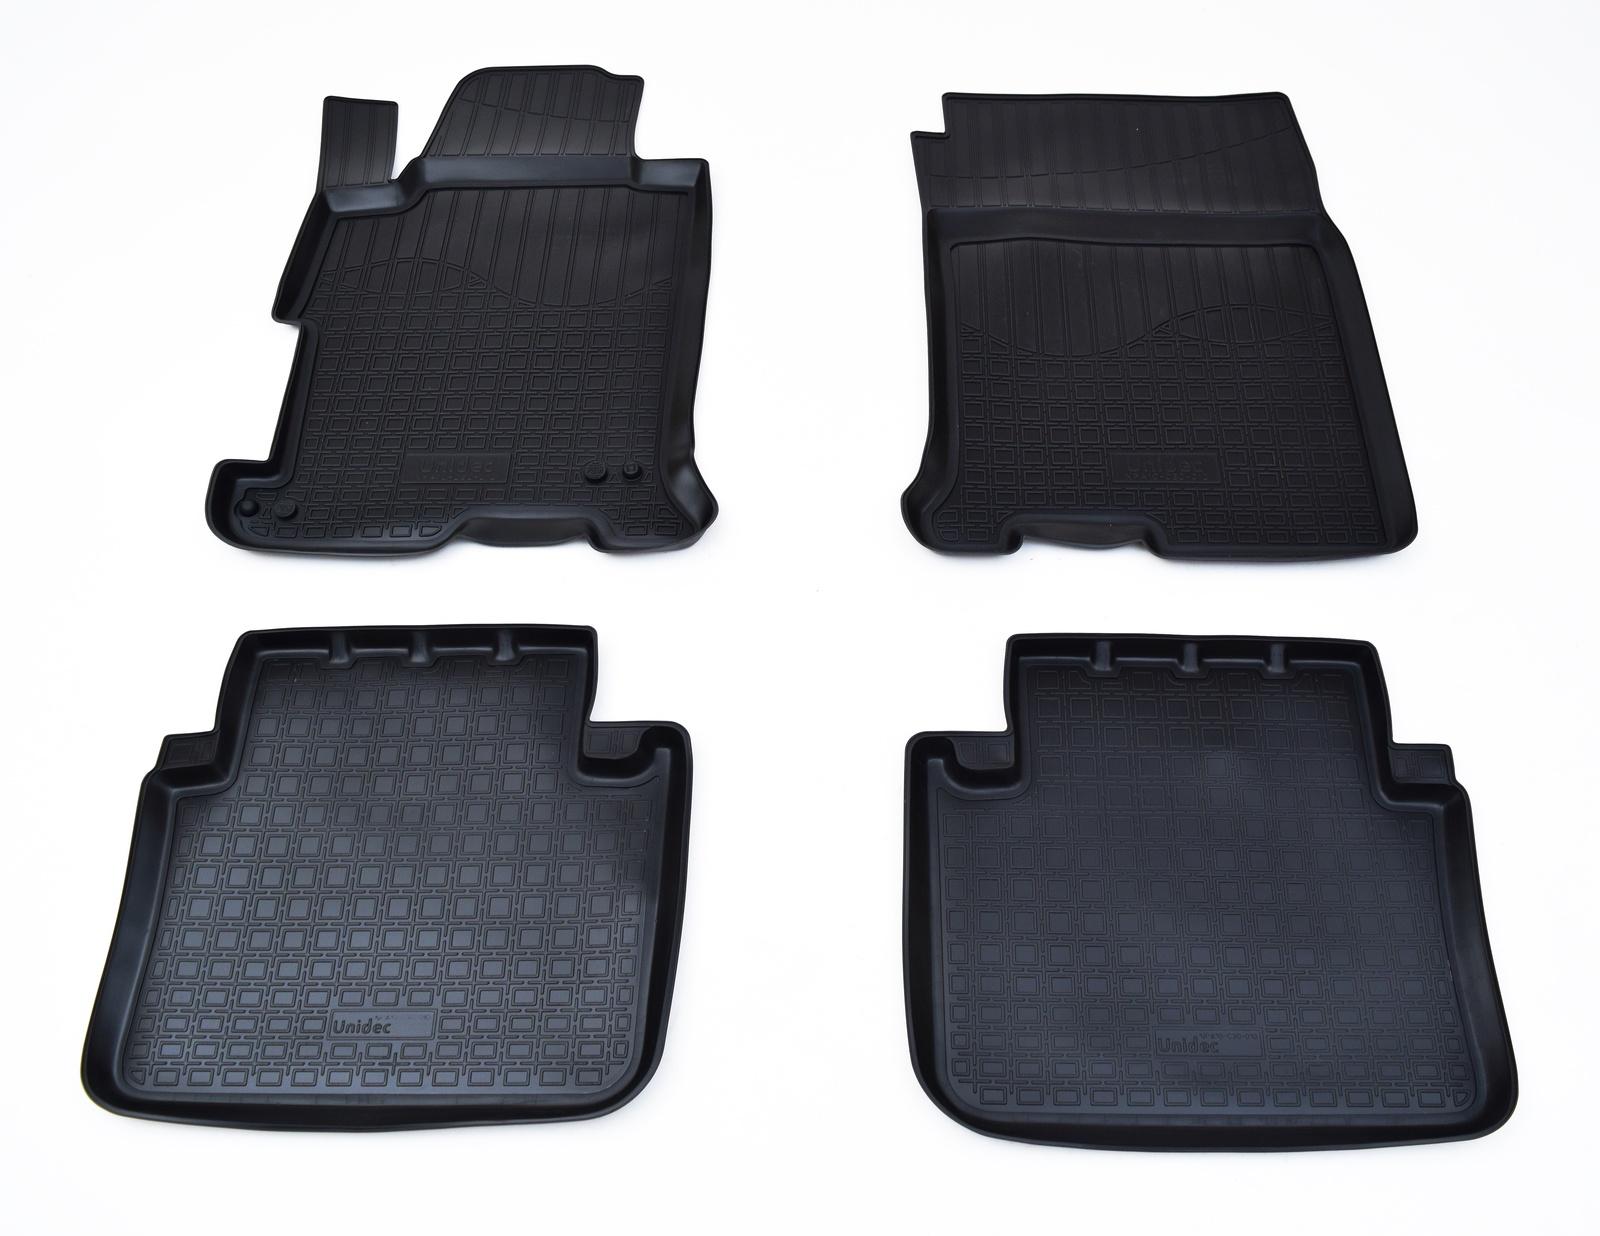 Коврики в салон Norplast для Honda Accord IX 2013, NPA10-C30-010, черный